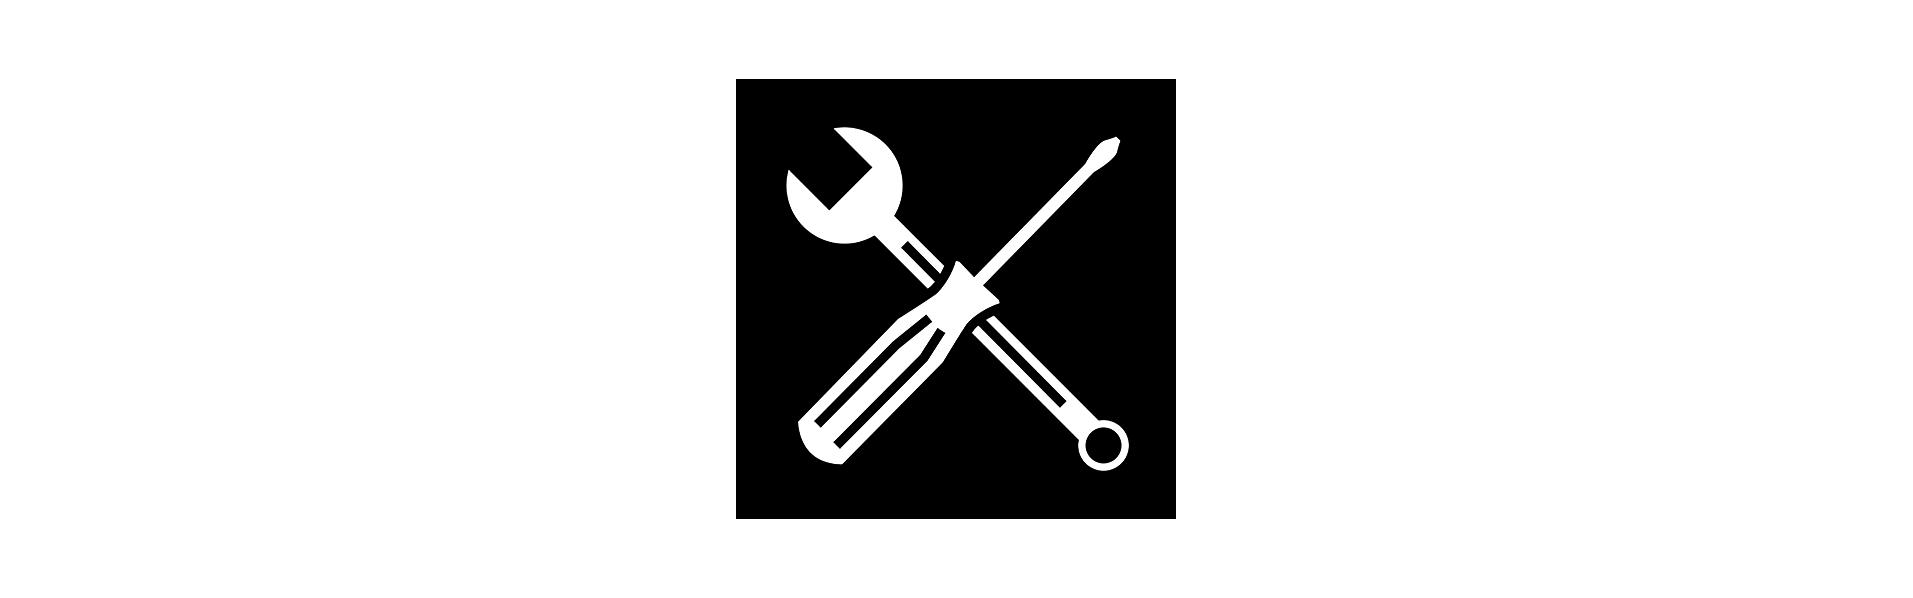 maintenance icon 2 smaller